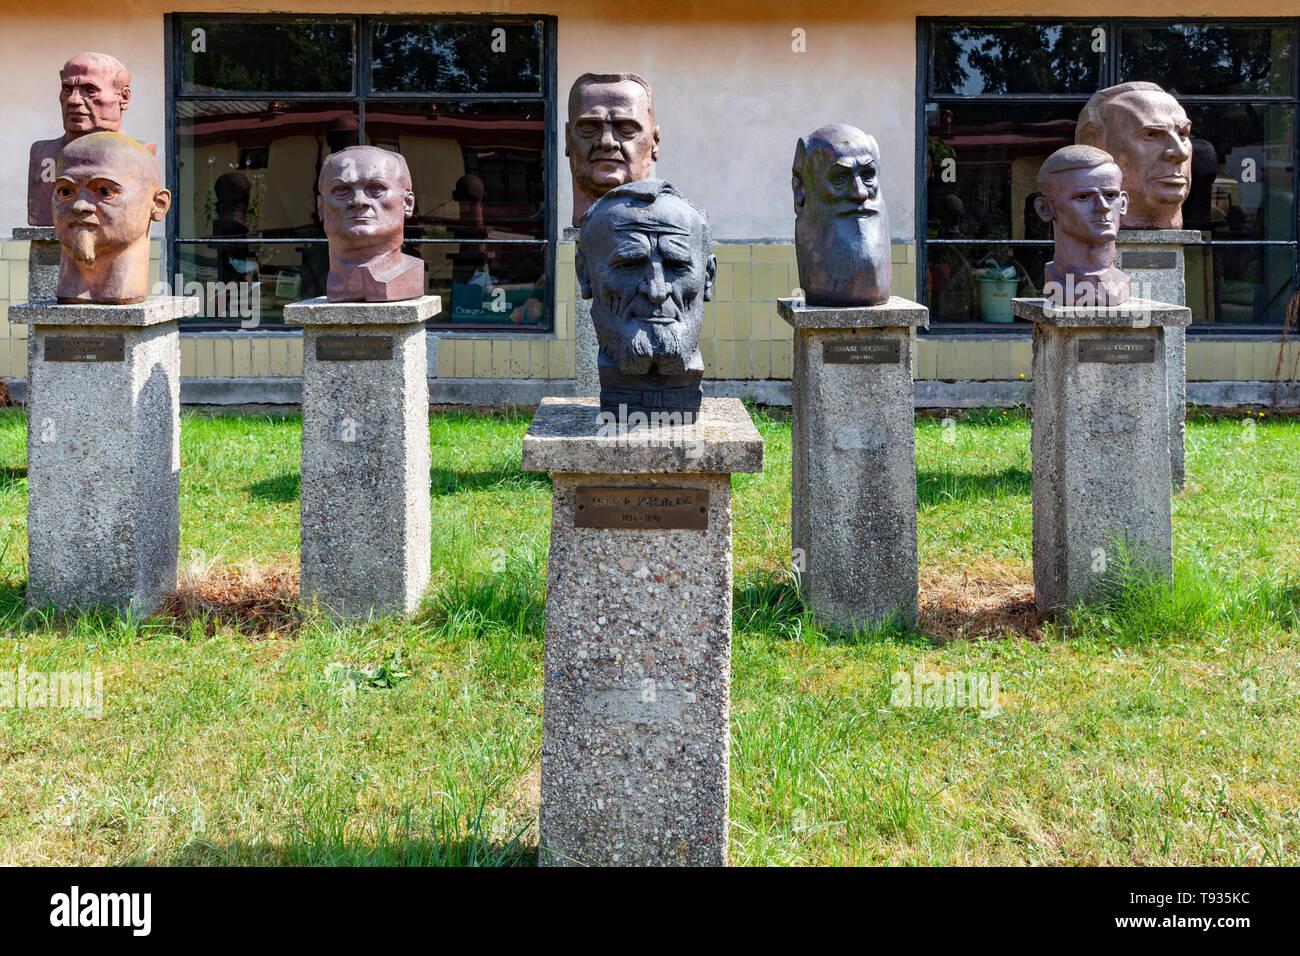 Ciechanowiec open-air museum, gallery of portrait sculptures, Poland, Europe - Stock Image